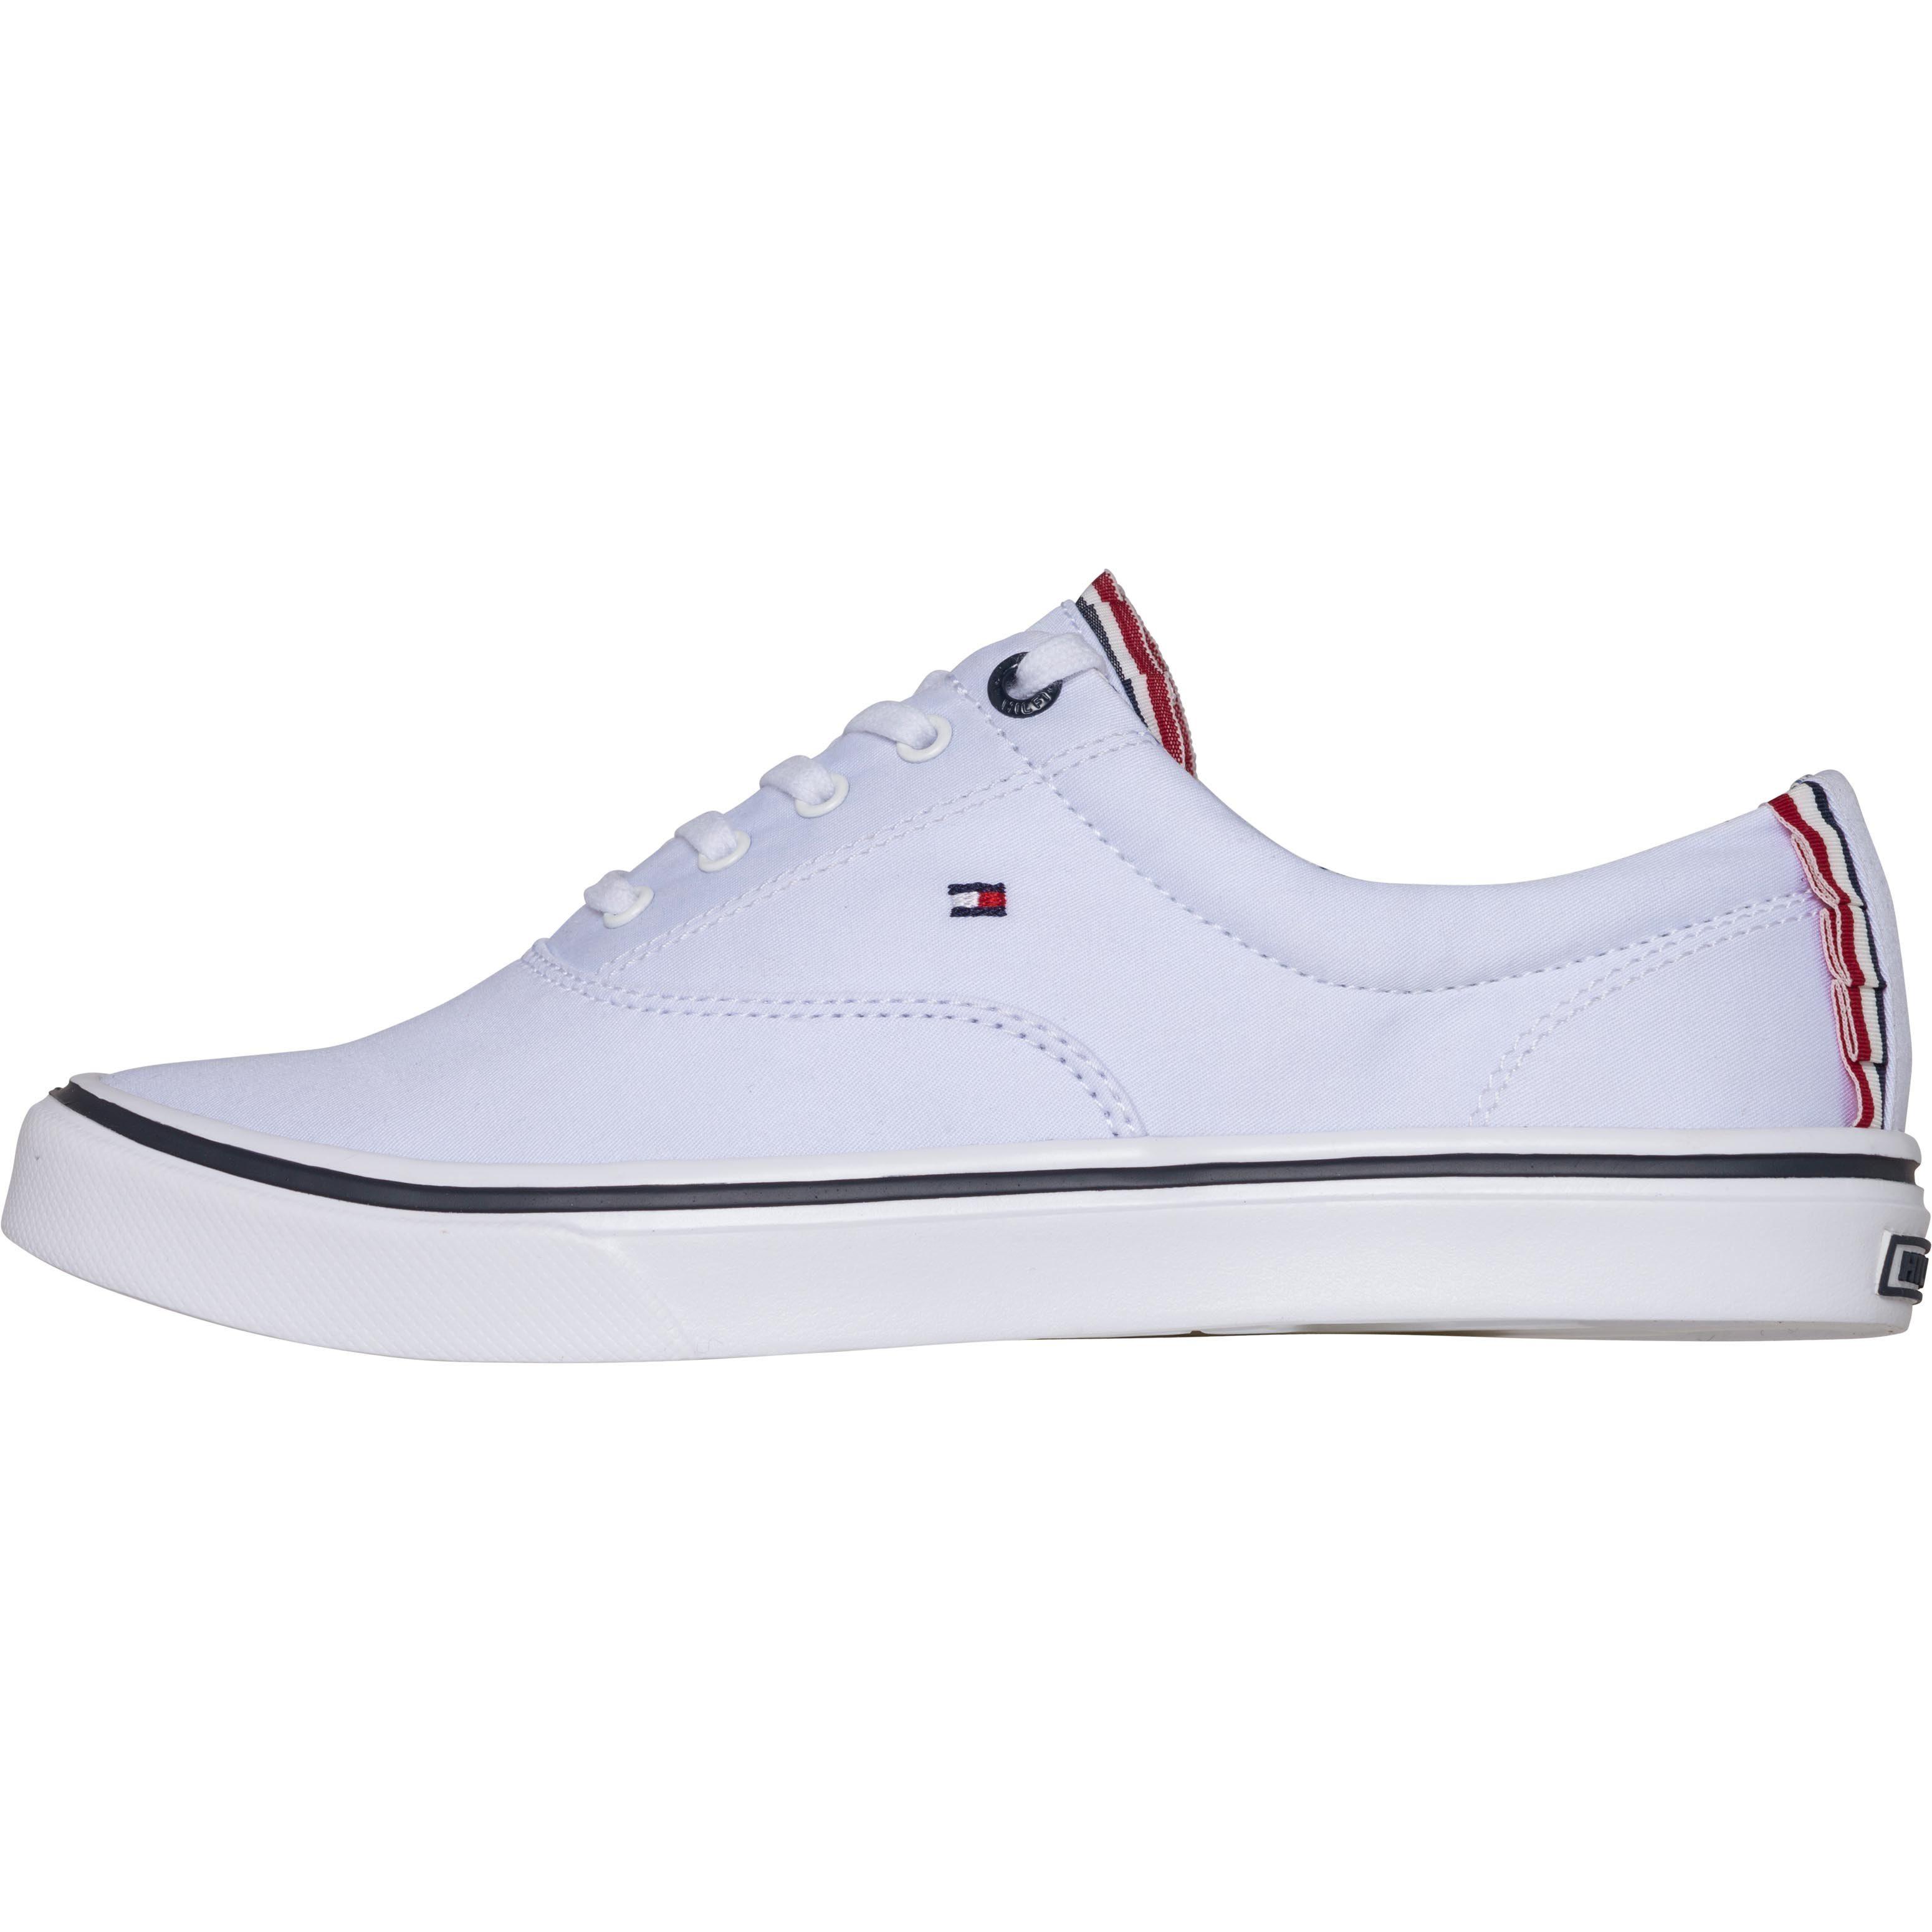 Tommy Hilfiger Sneaker TEXTILE LIGHT WEIGHT SNEAKER online kaufen  WHITE